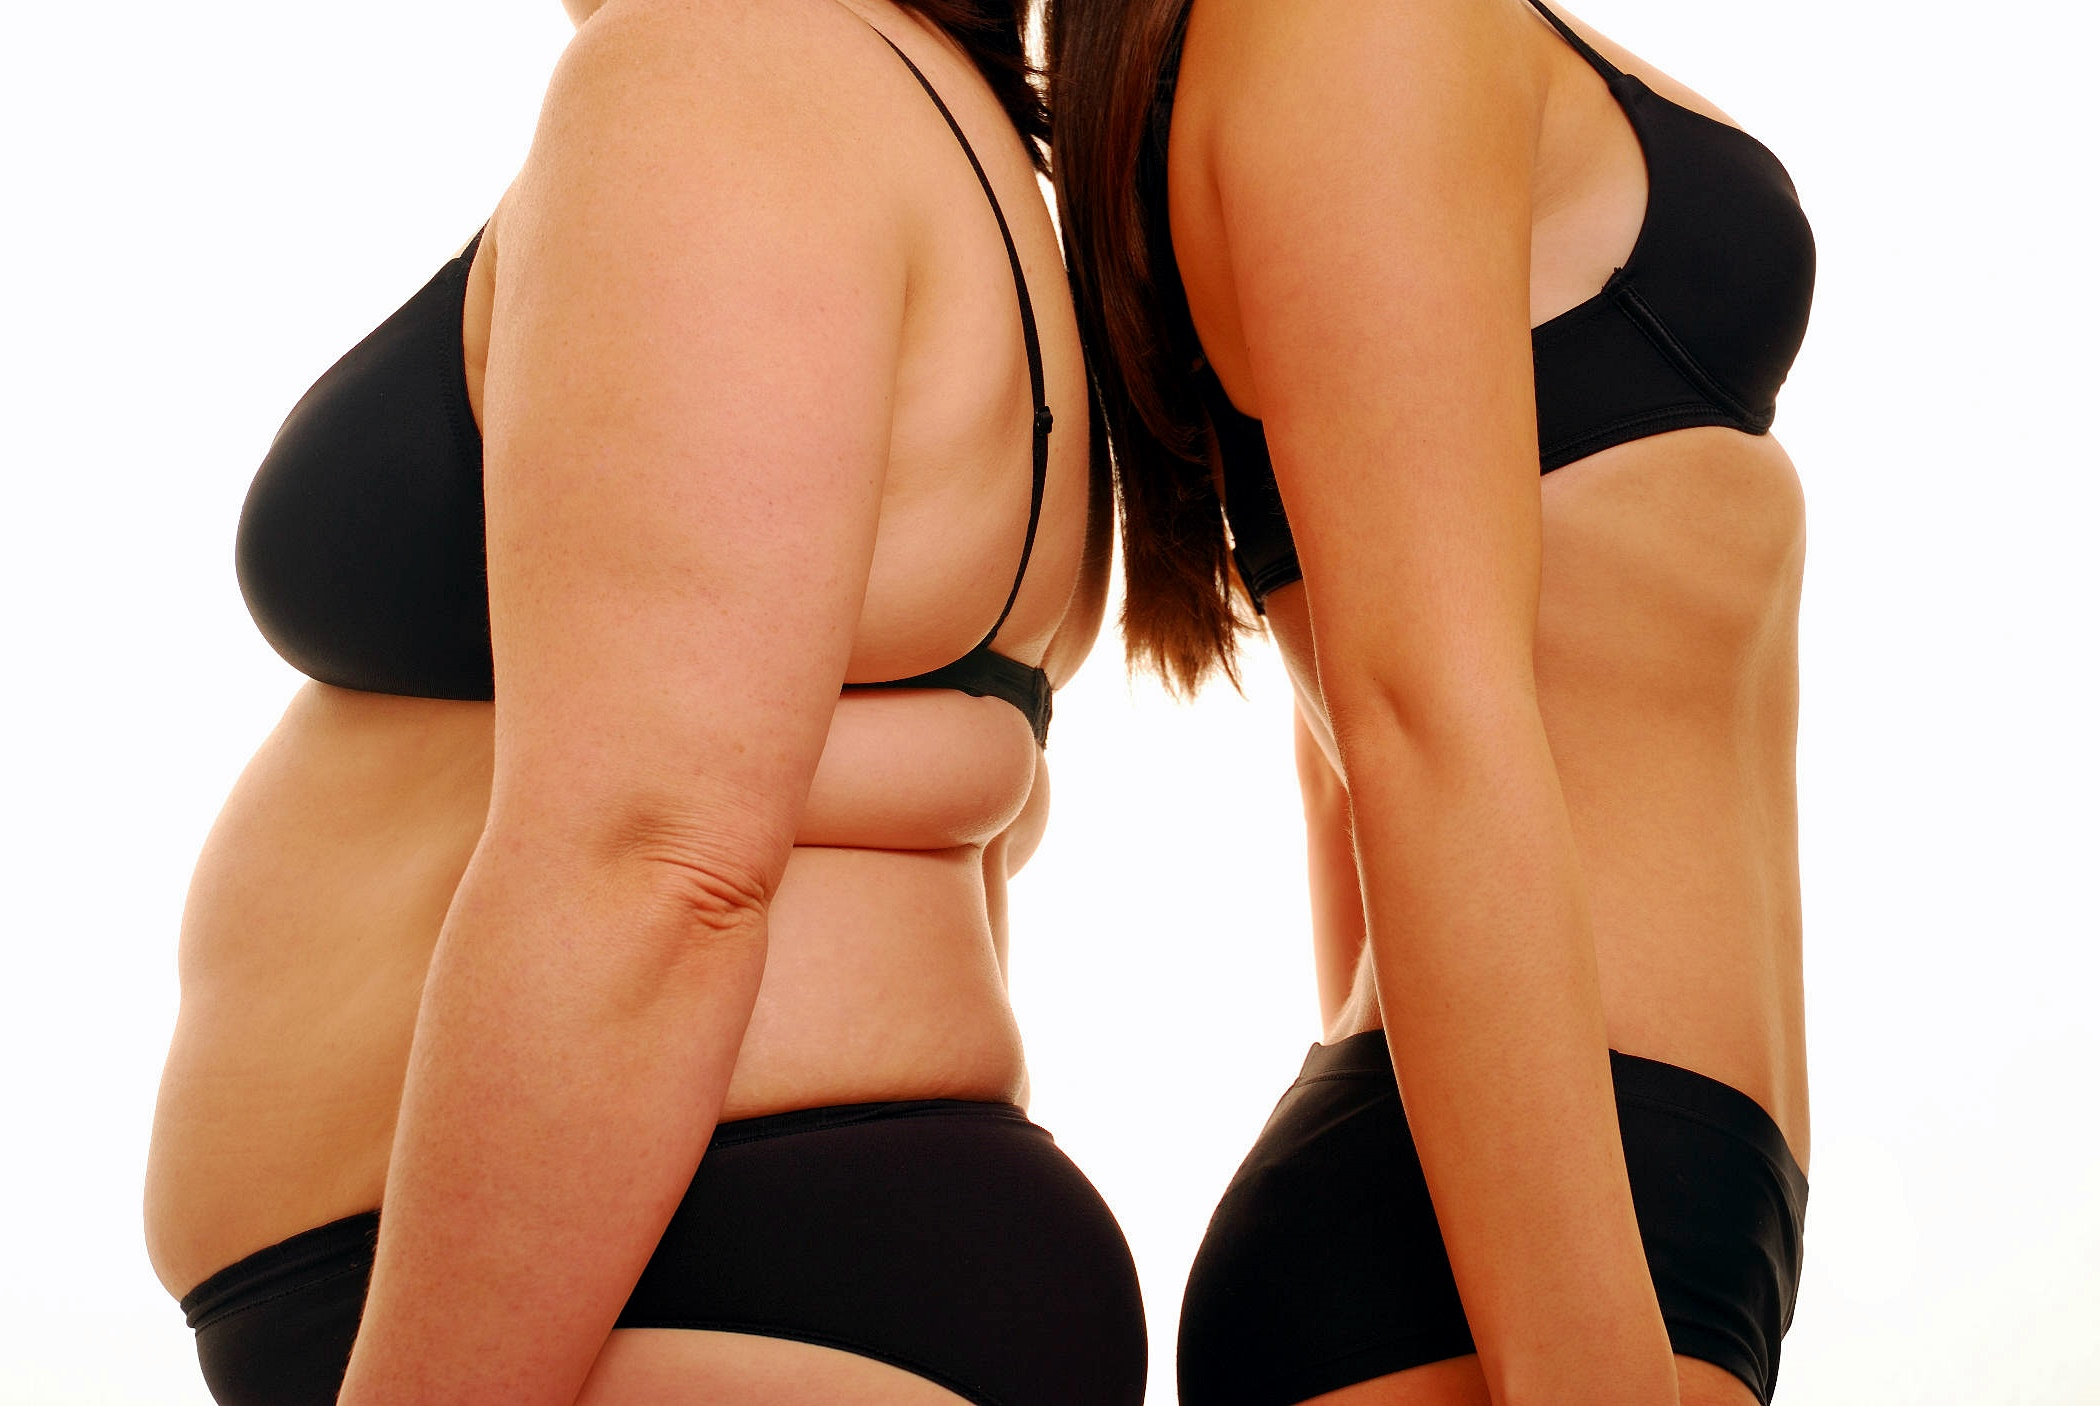 efeblog_mujer-gorda-mujer-delgada